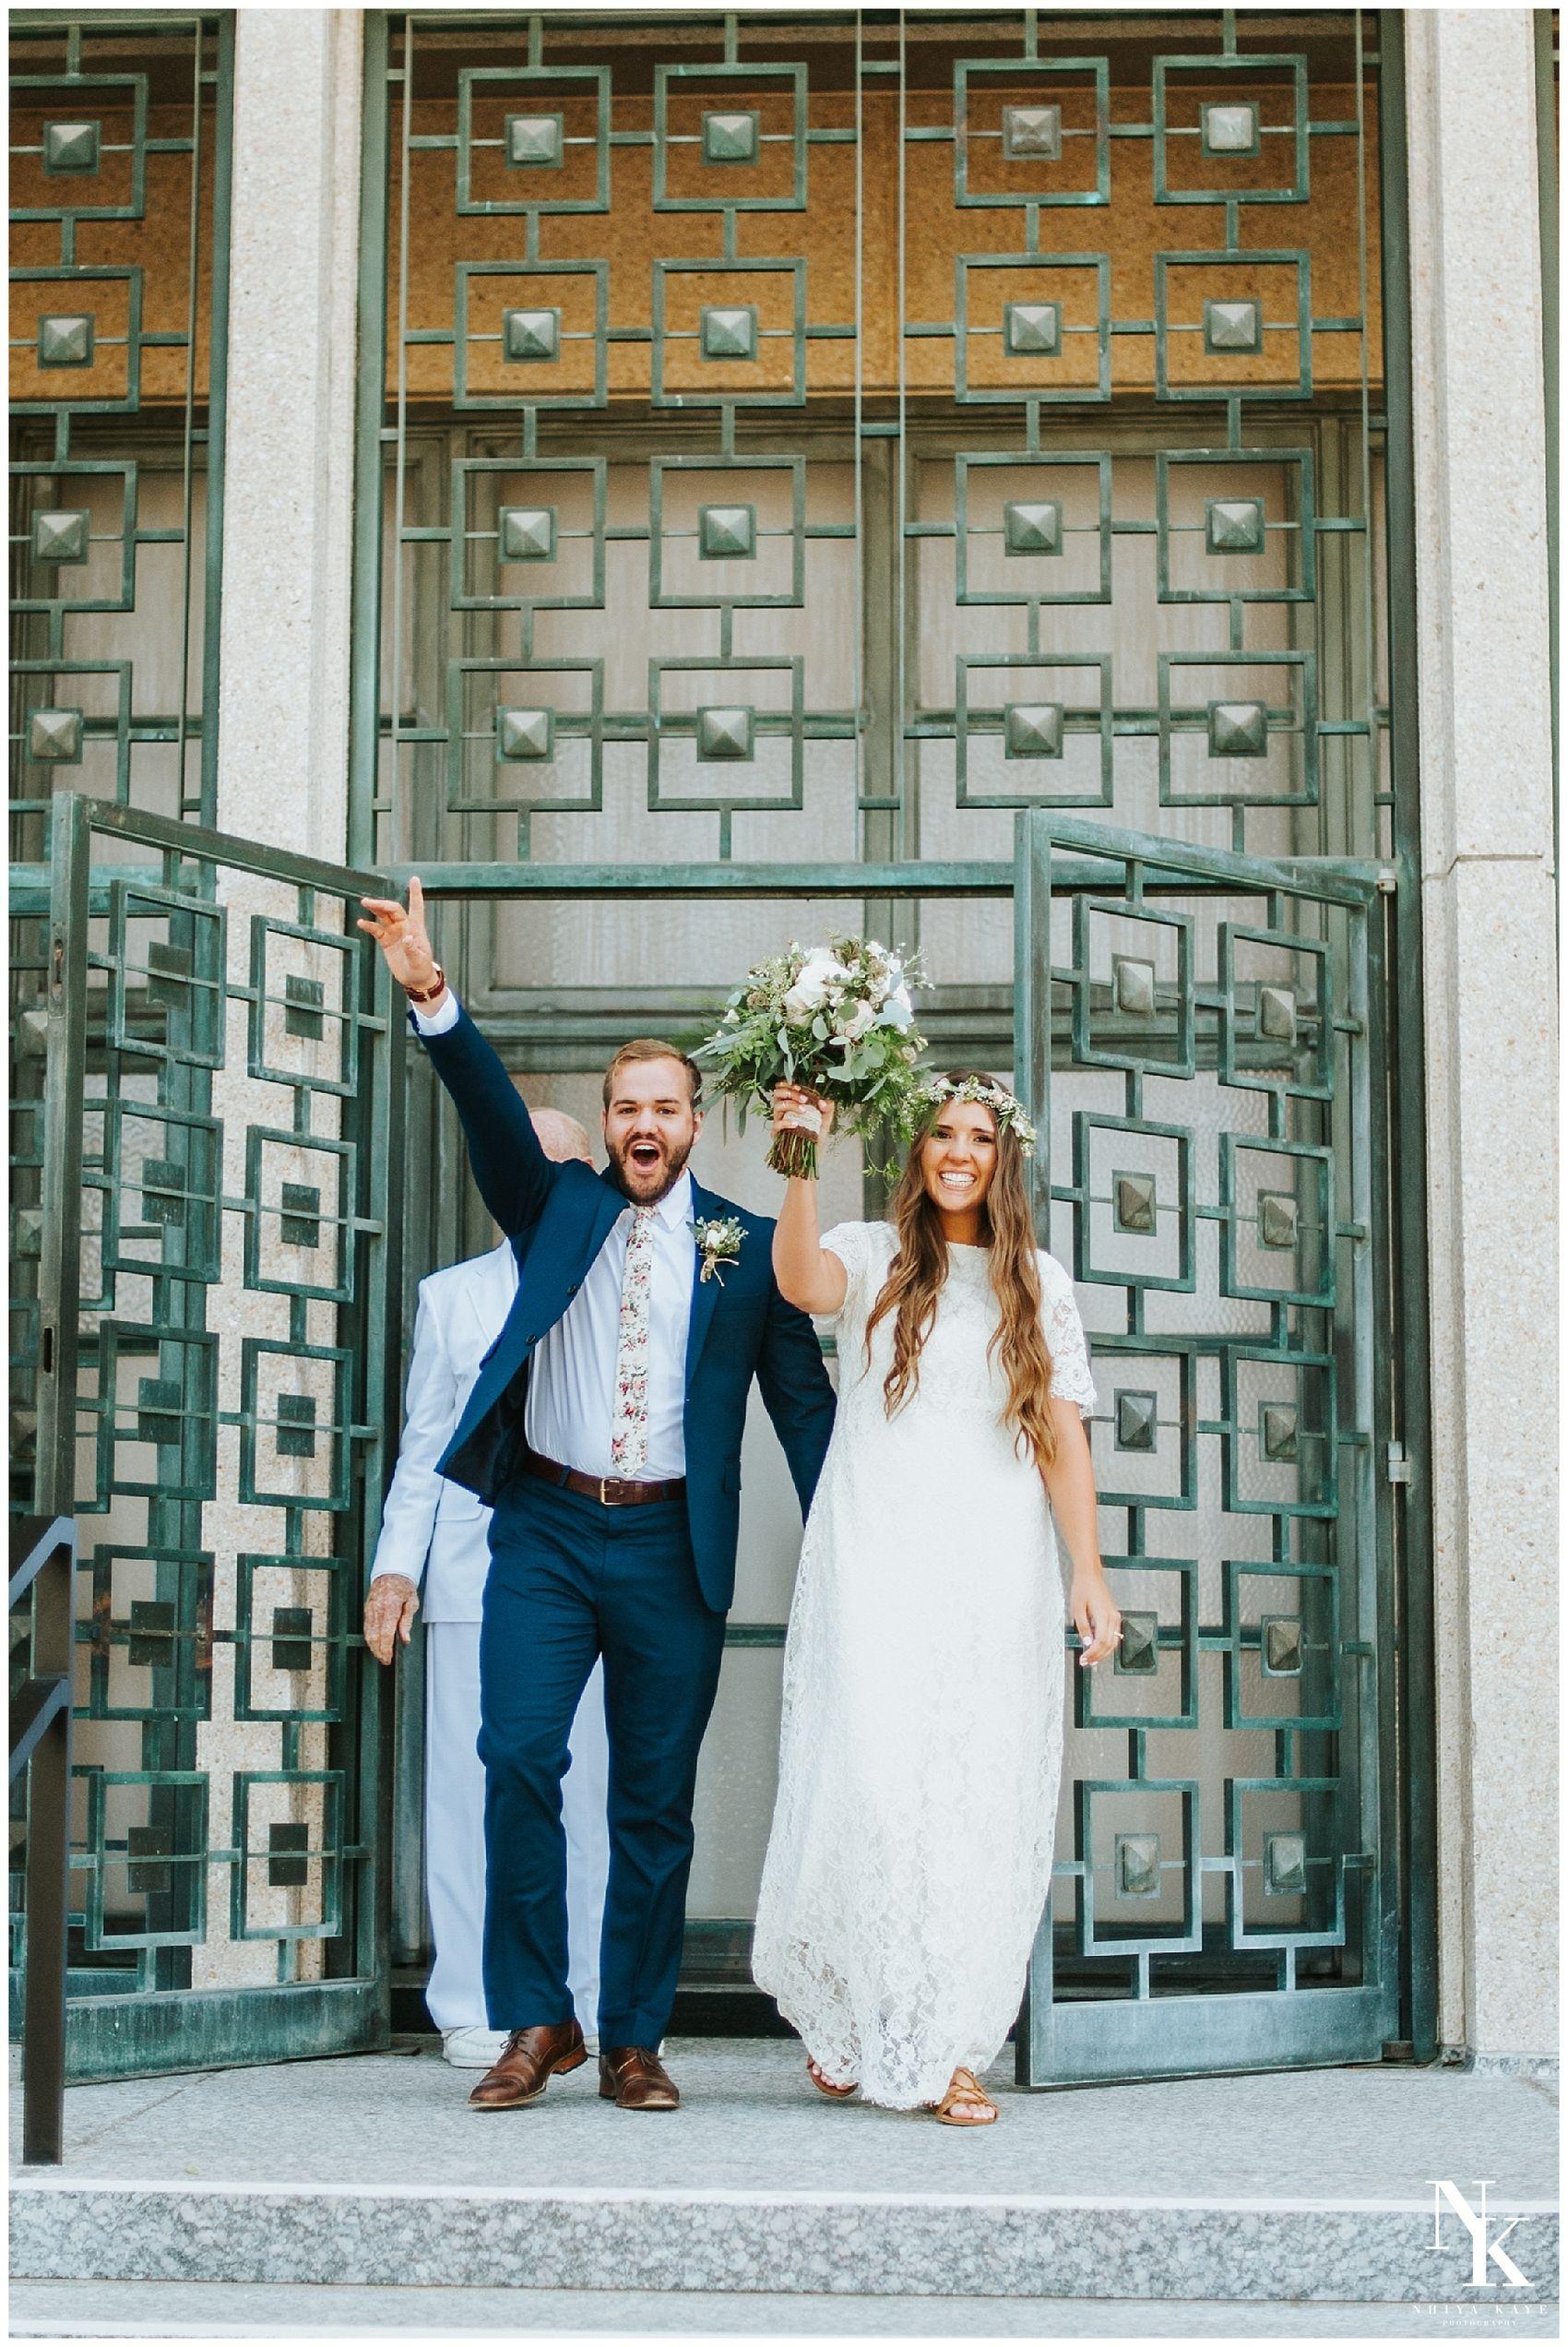 Los angeles temple wedding boho wedding diy wedding lace wedding